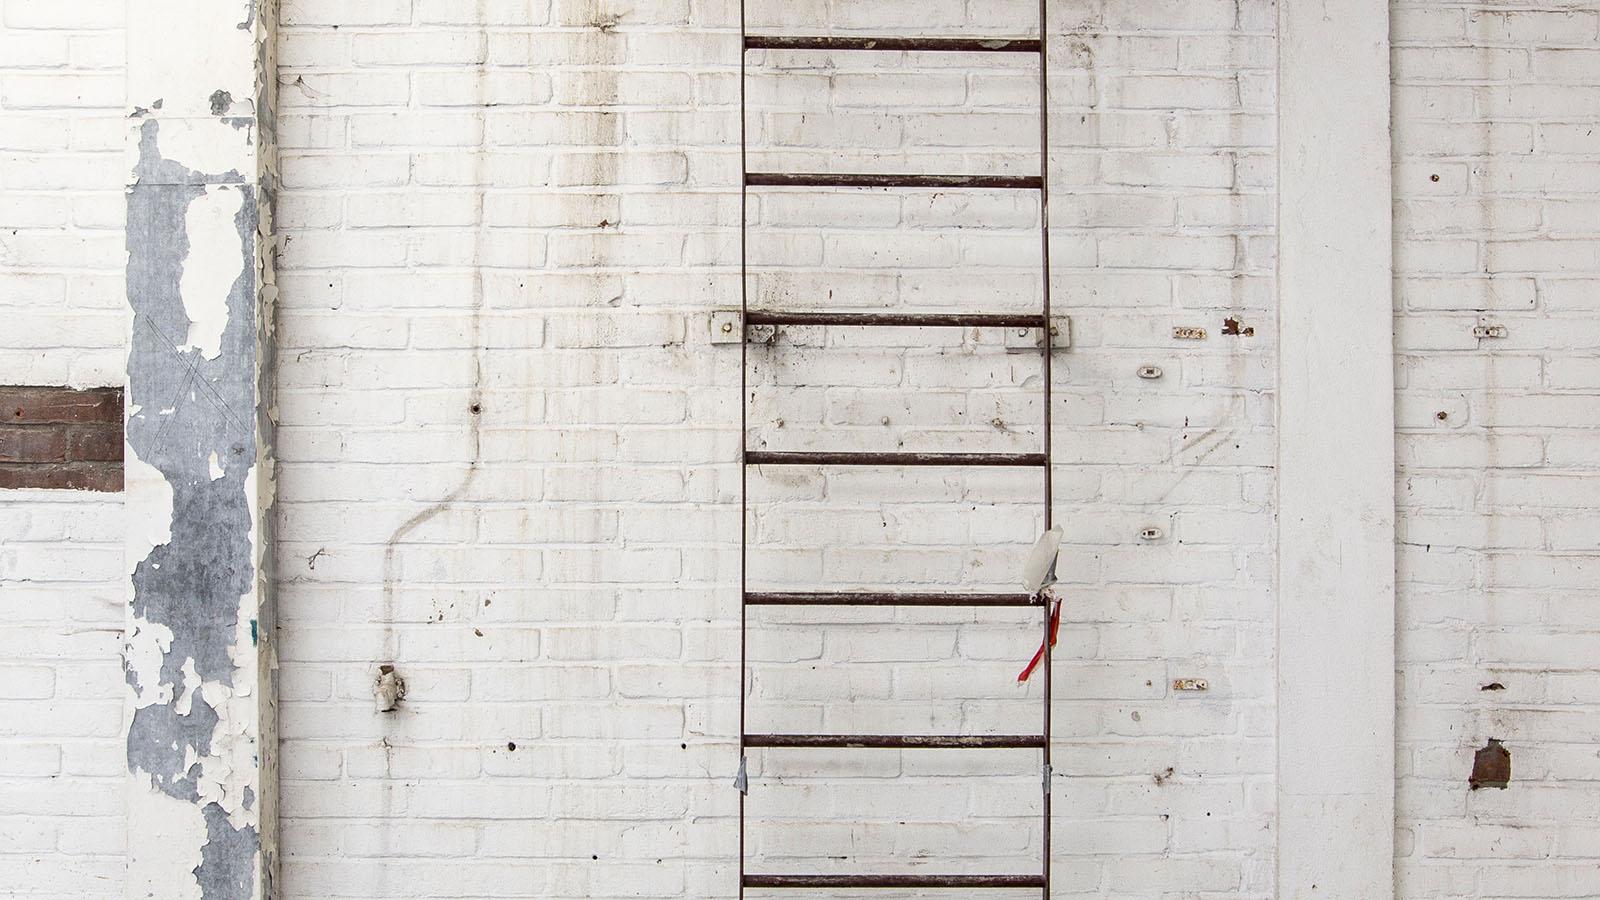 Brick wall studio